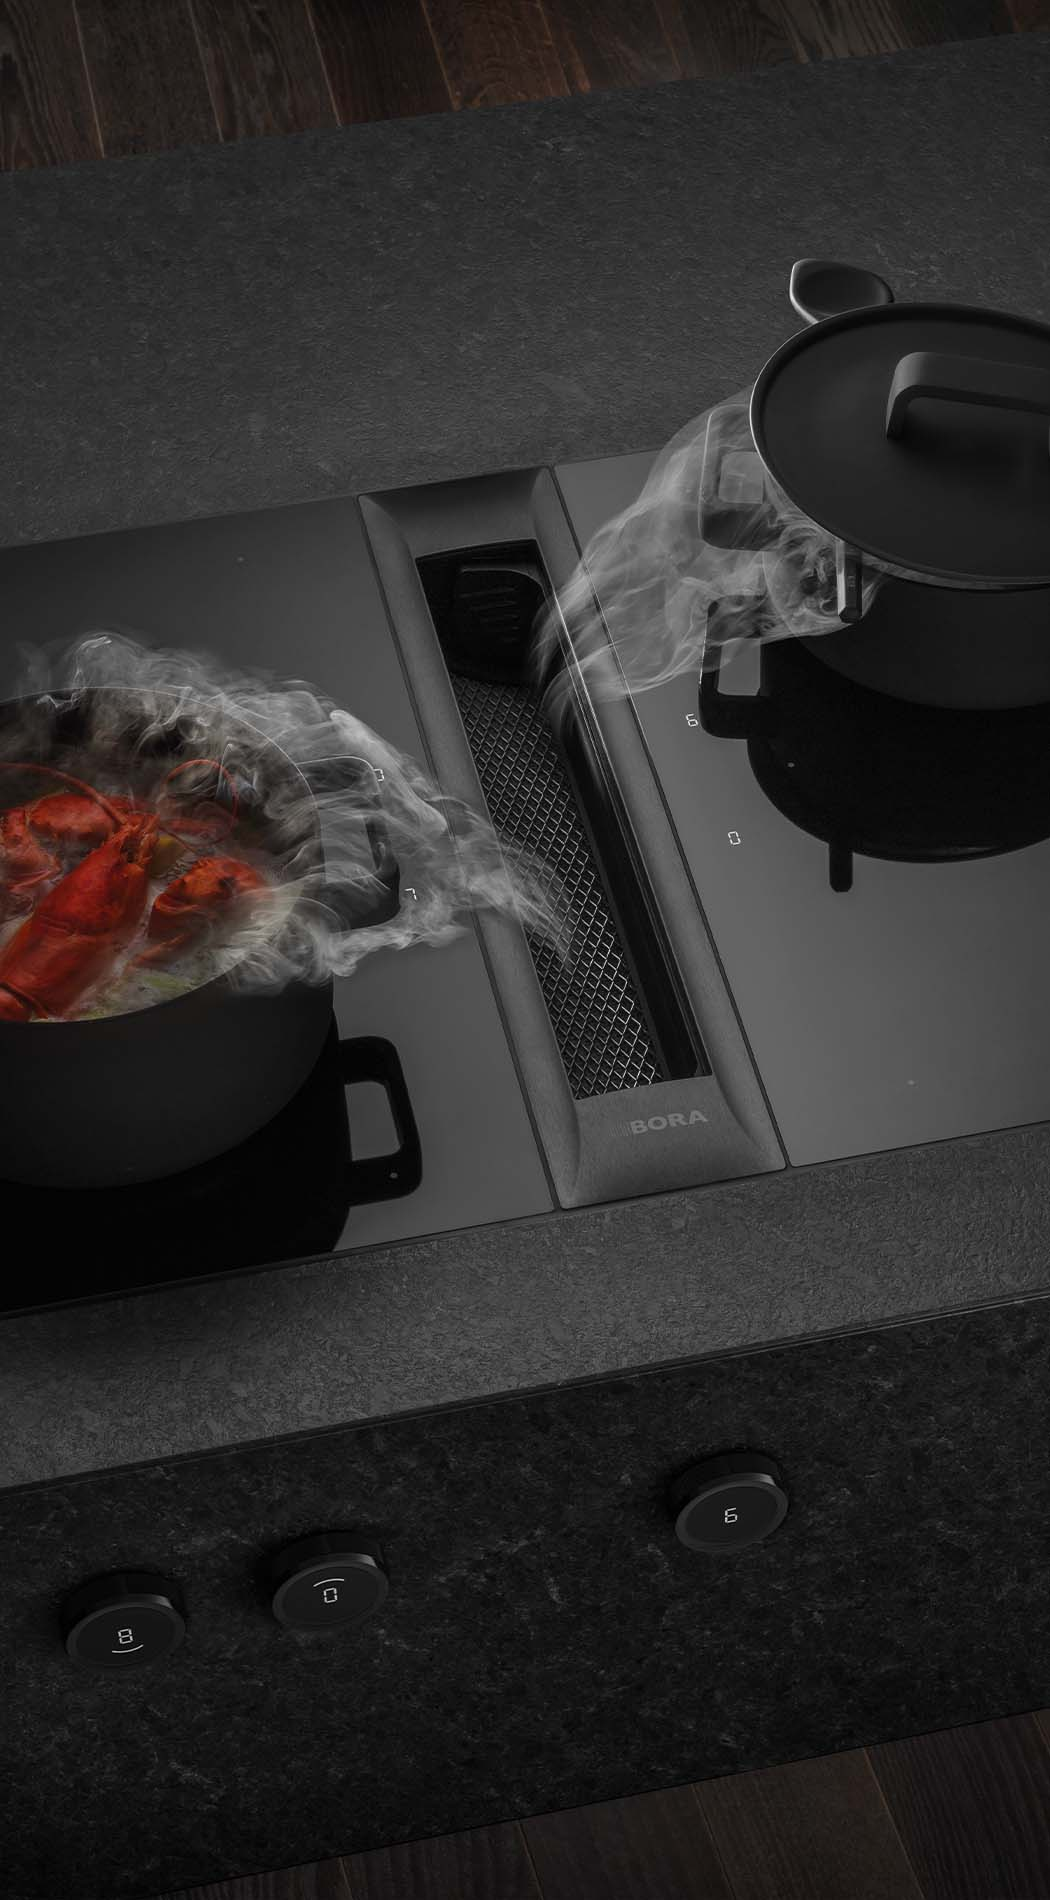 BORA Professional 3.0, BORA Kookplaat met Afzuiging, ASWA Keukens